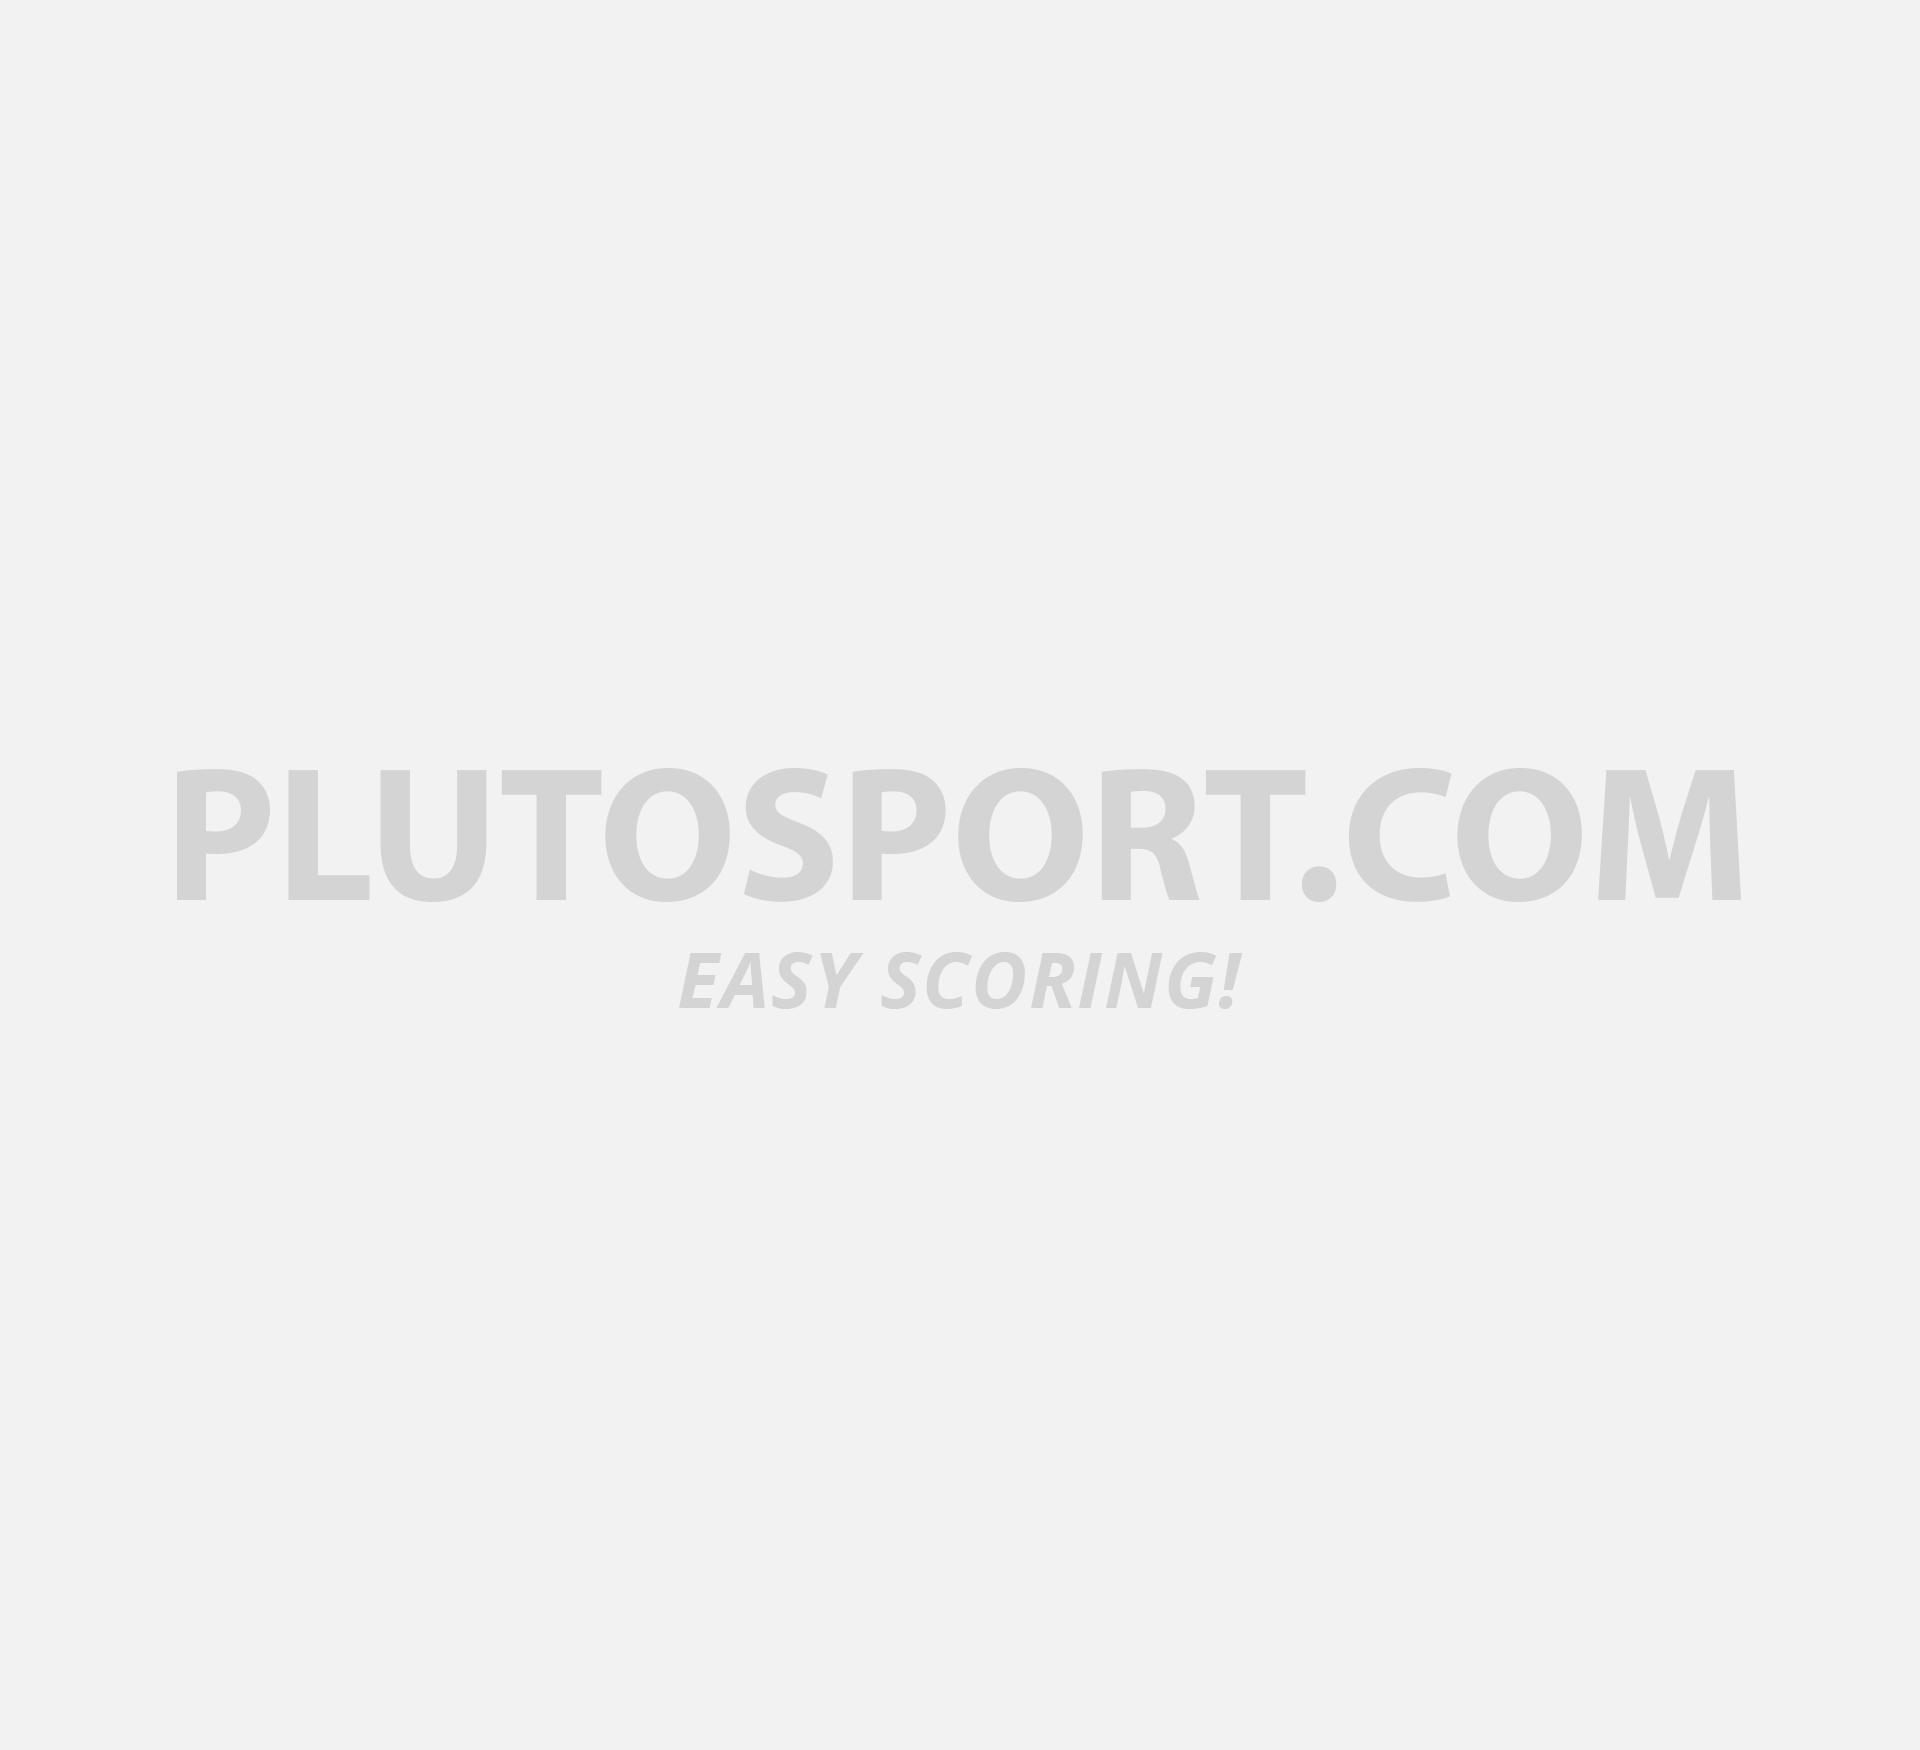 31b1e0254397 Puma Fundamentals Sports Bag M - Without shoe compartment - Bags - Football  - Sports